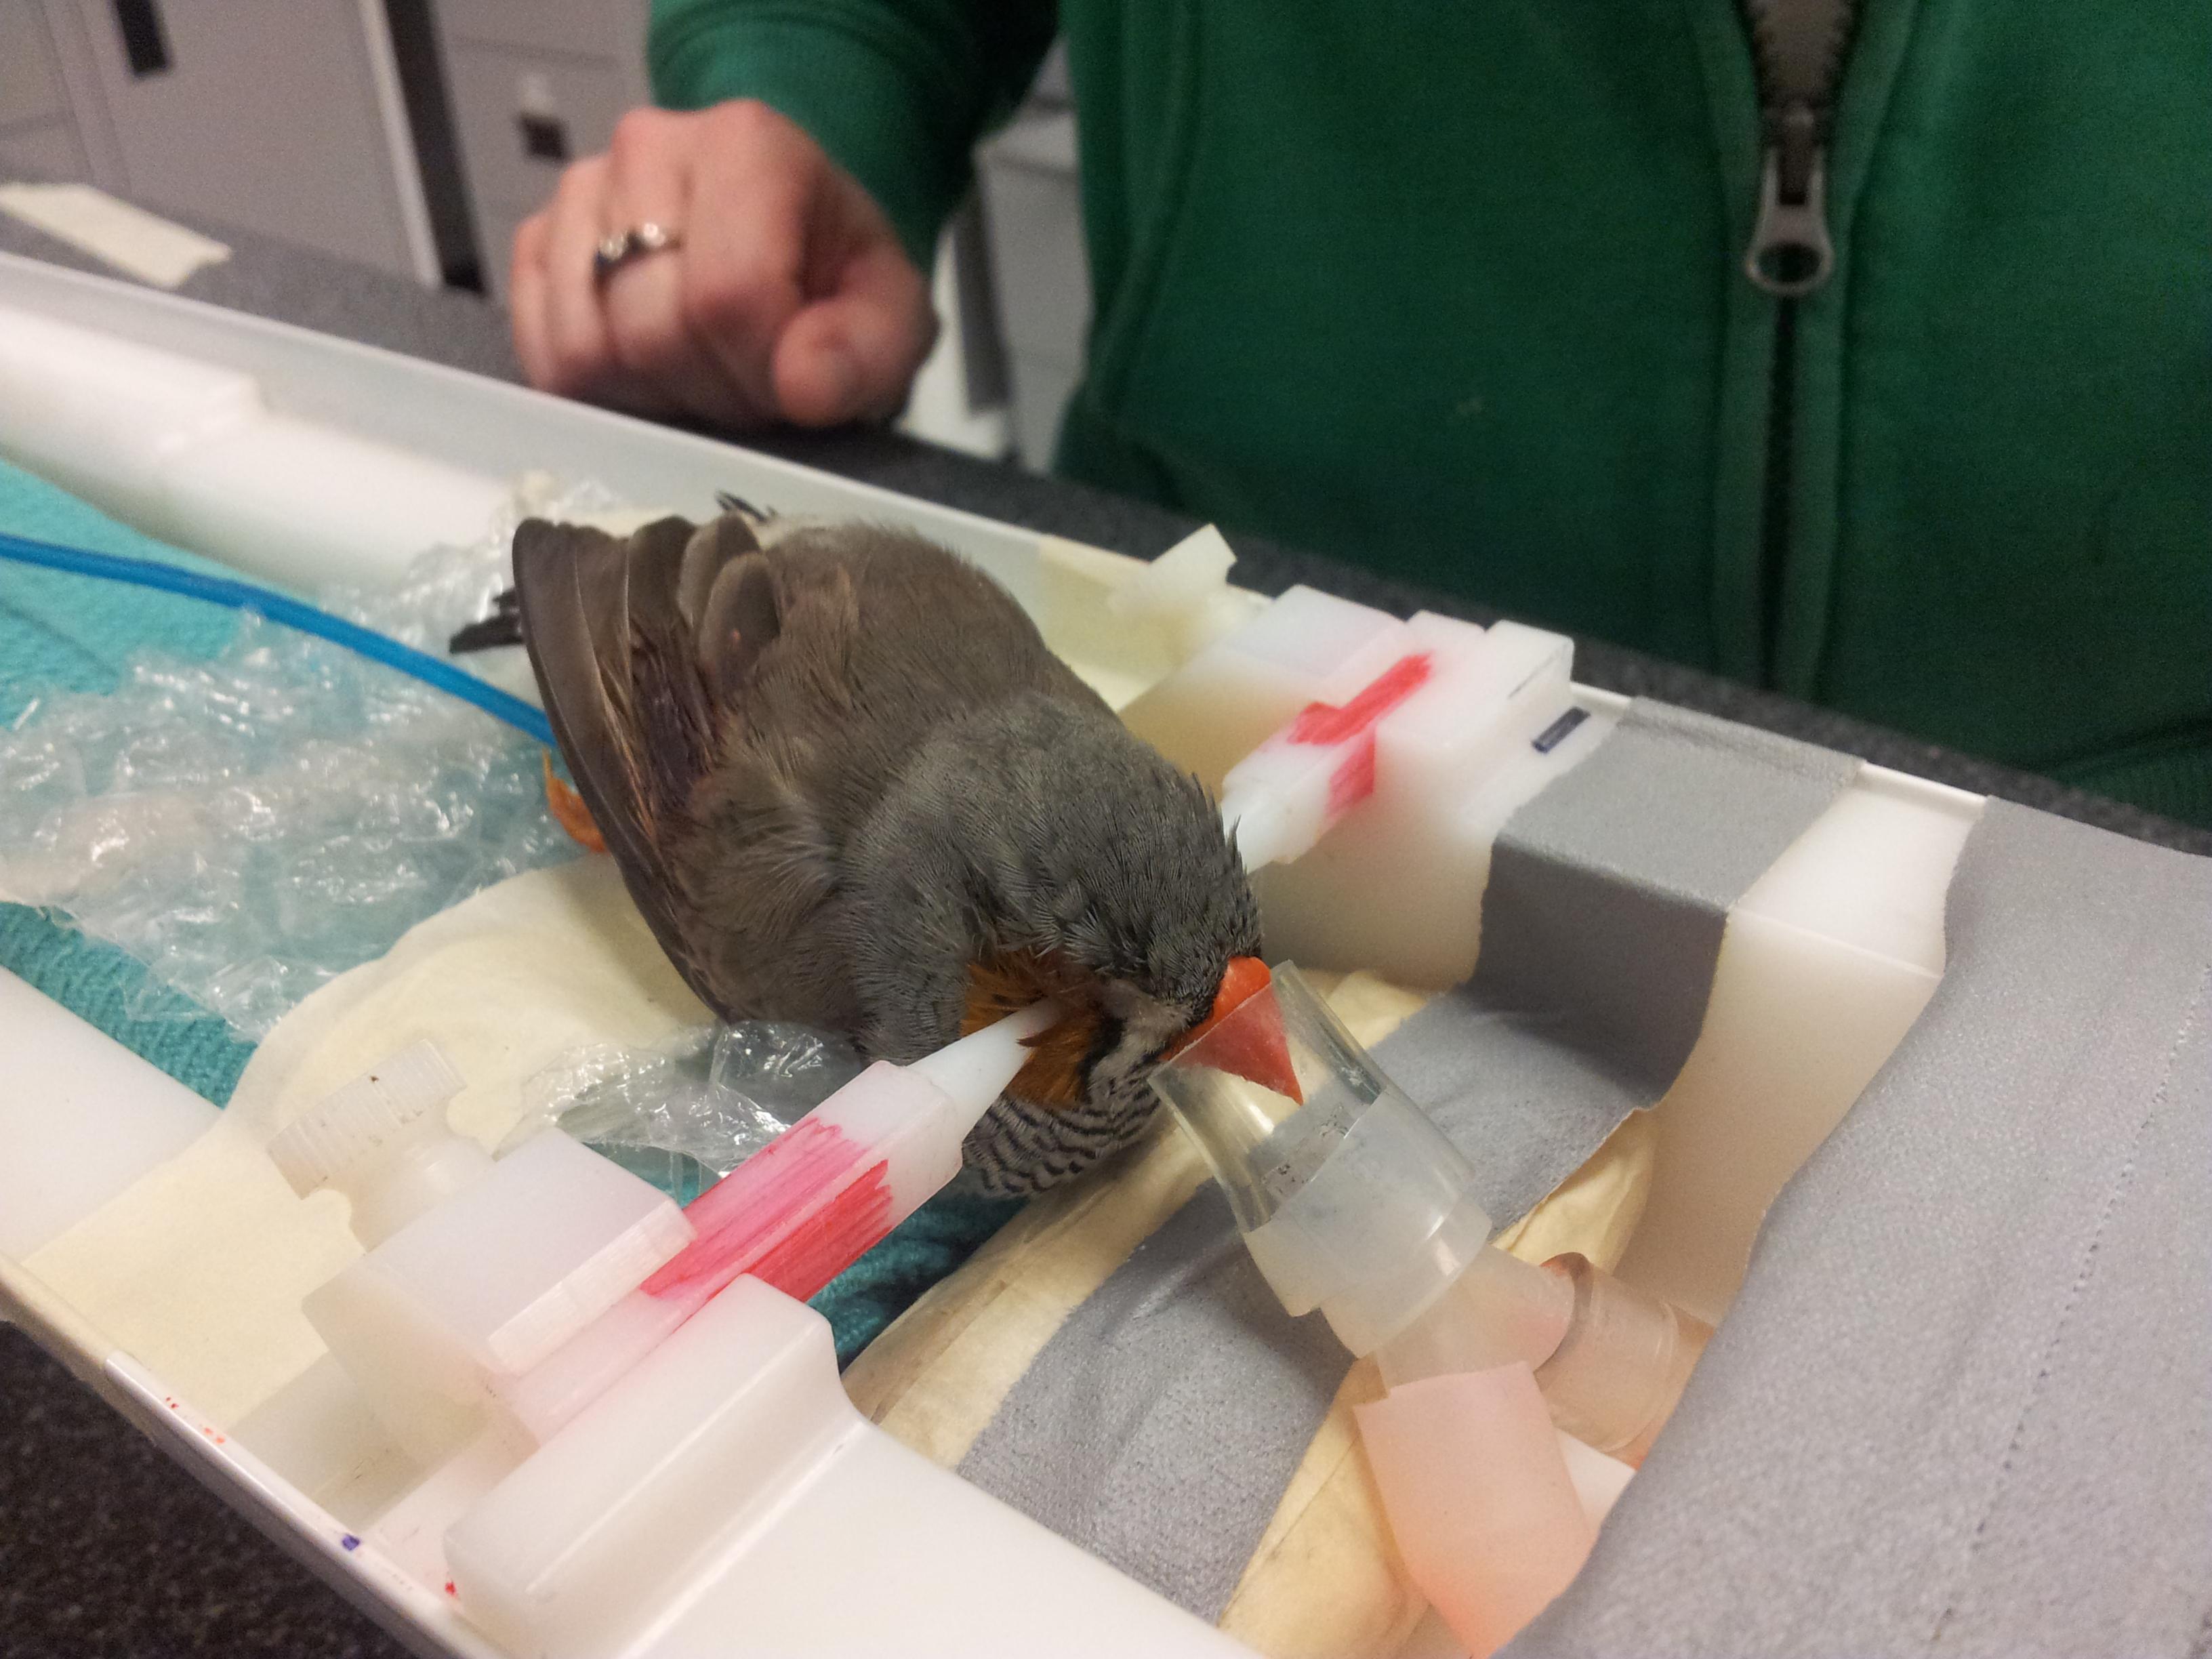 mri imaging of the avian brain